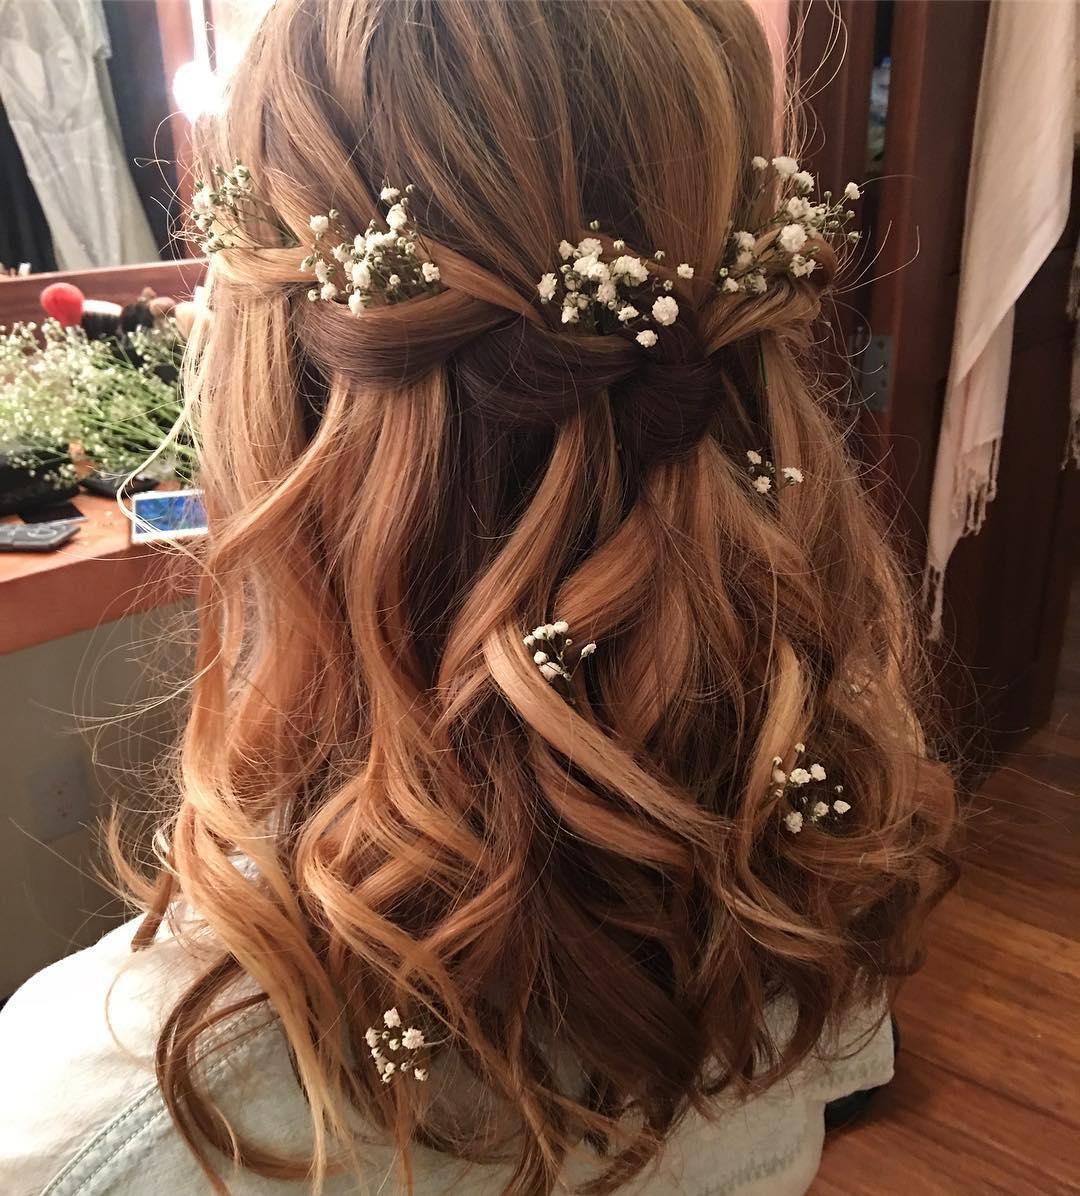 10 Lavish Wedding Hairstyles for Long Hair